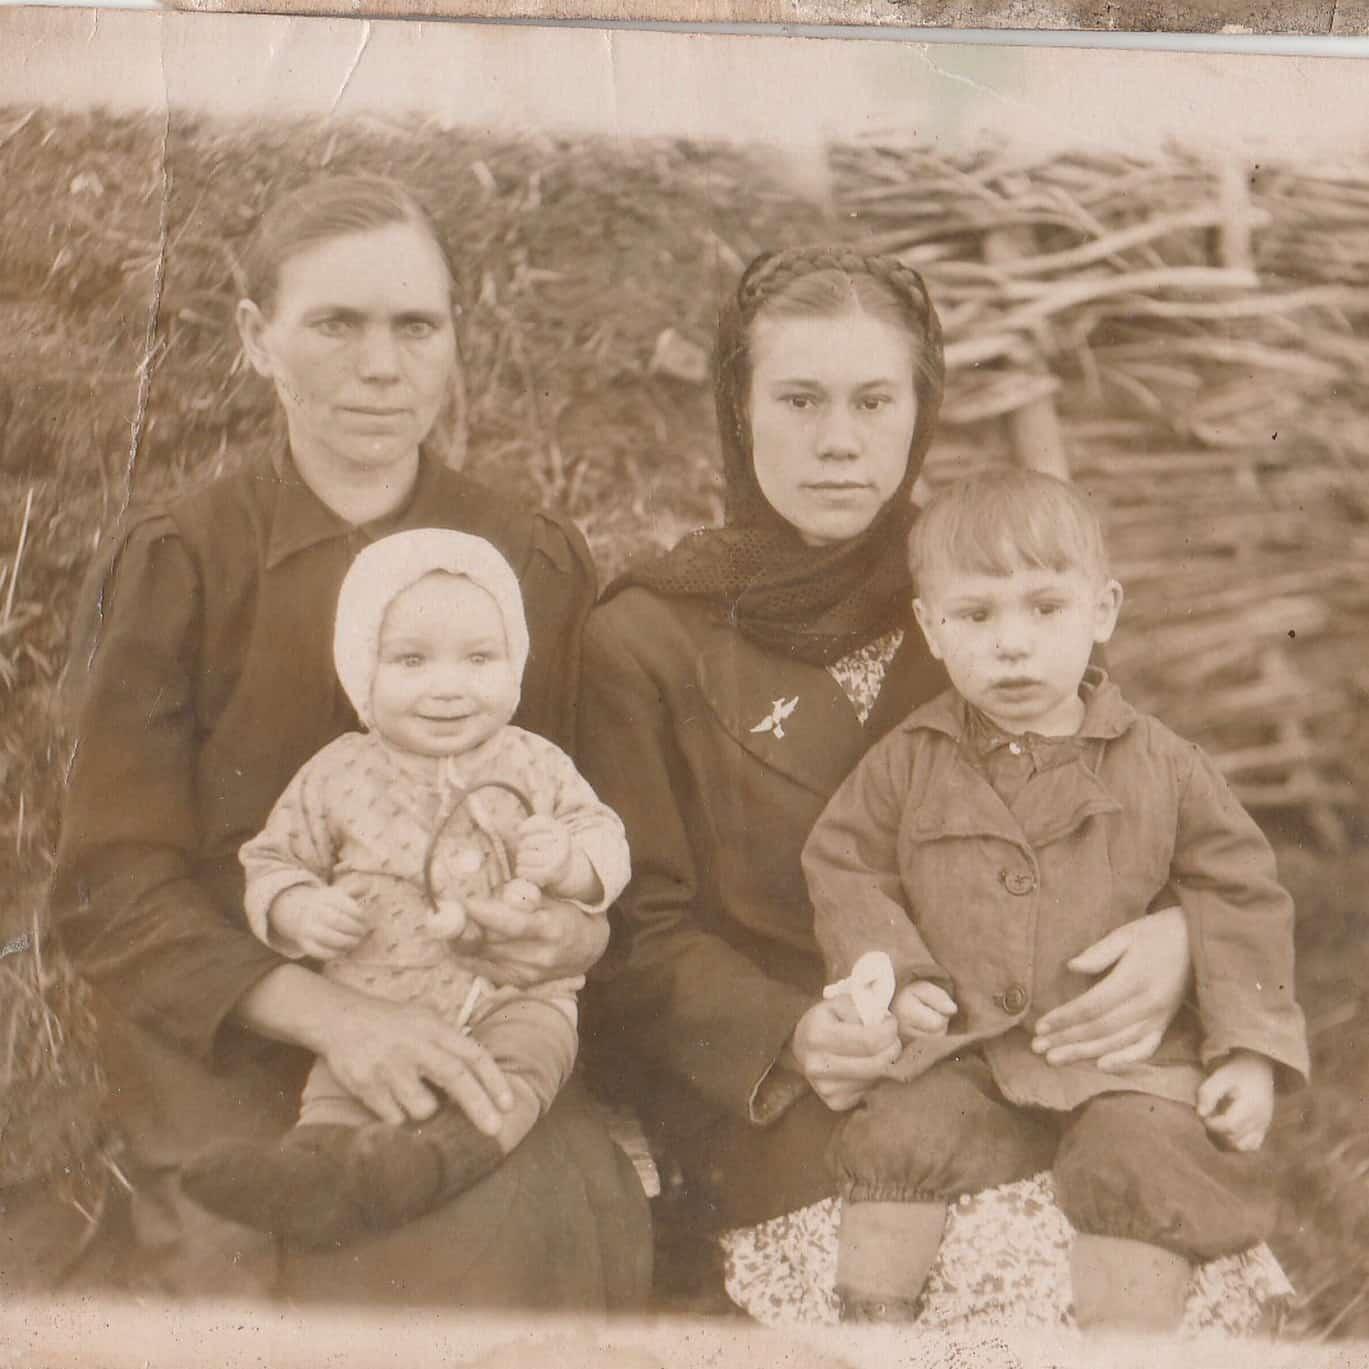 баба Нюра, отец на коленях сестры